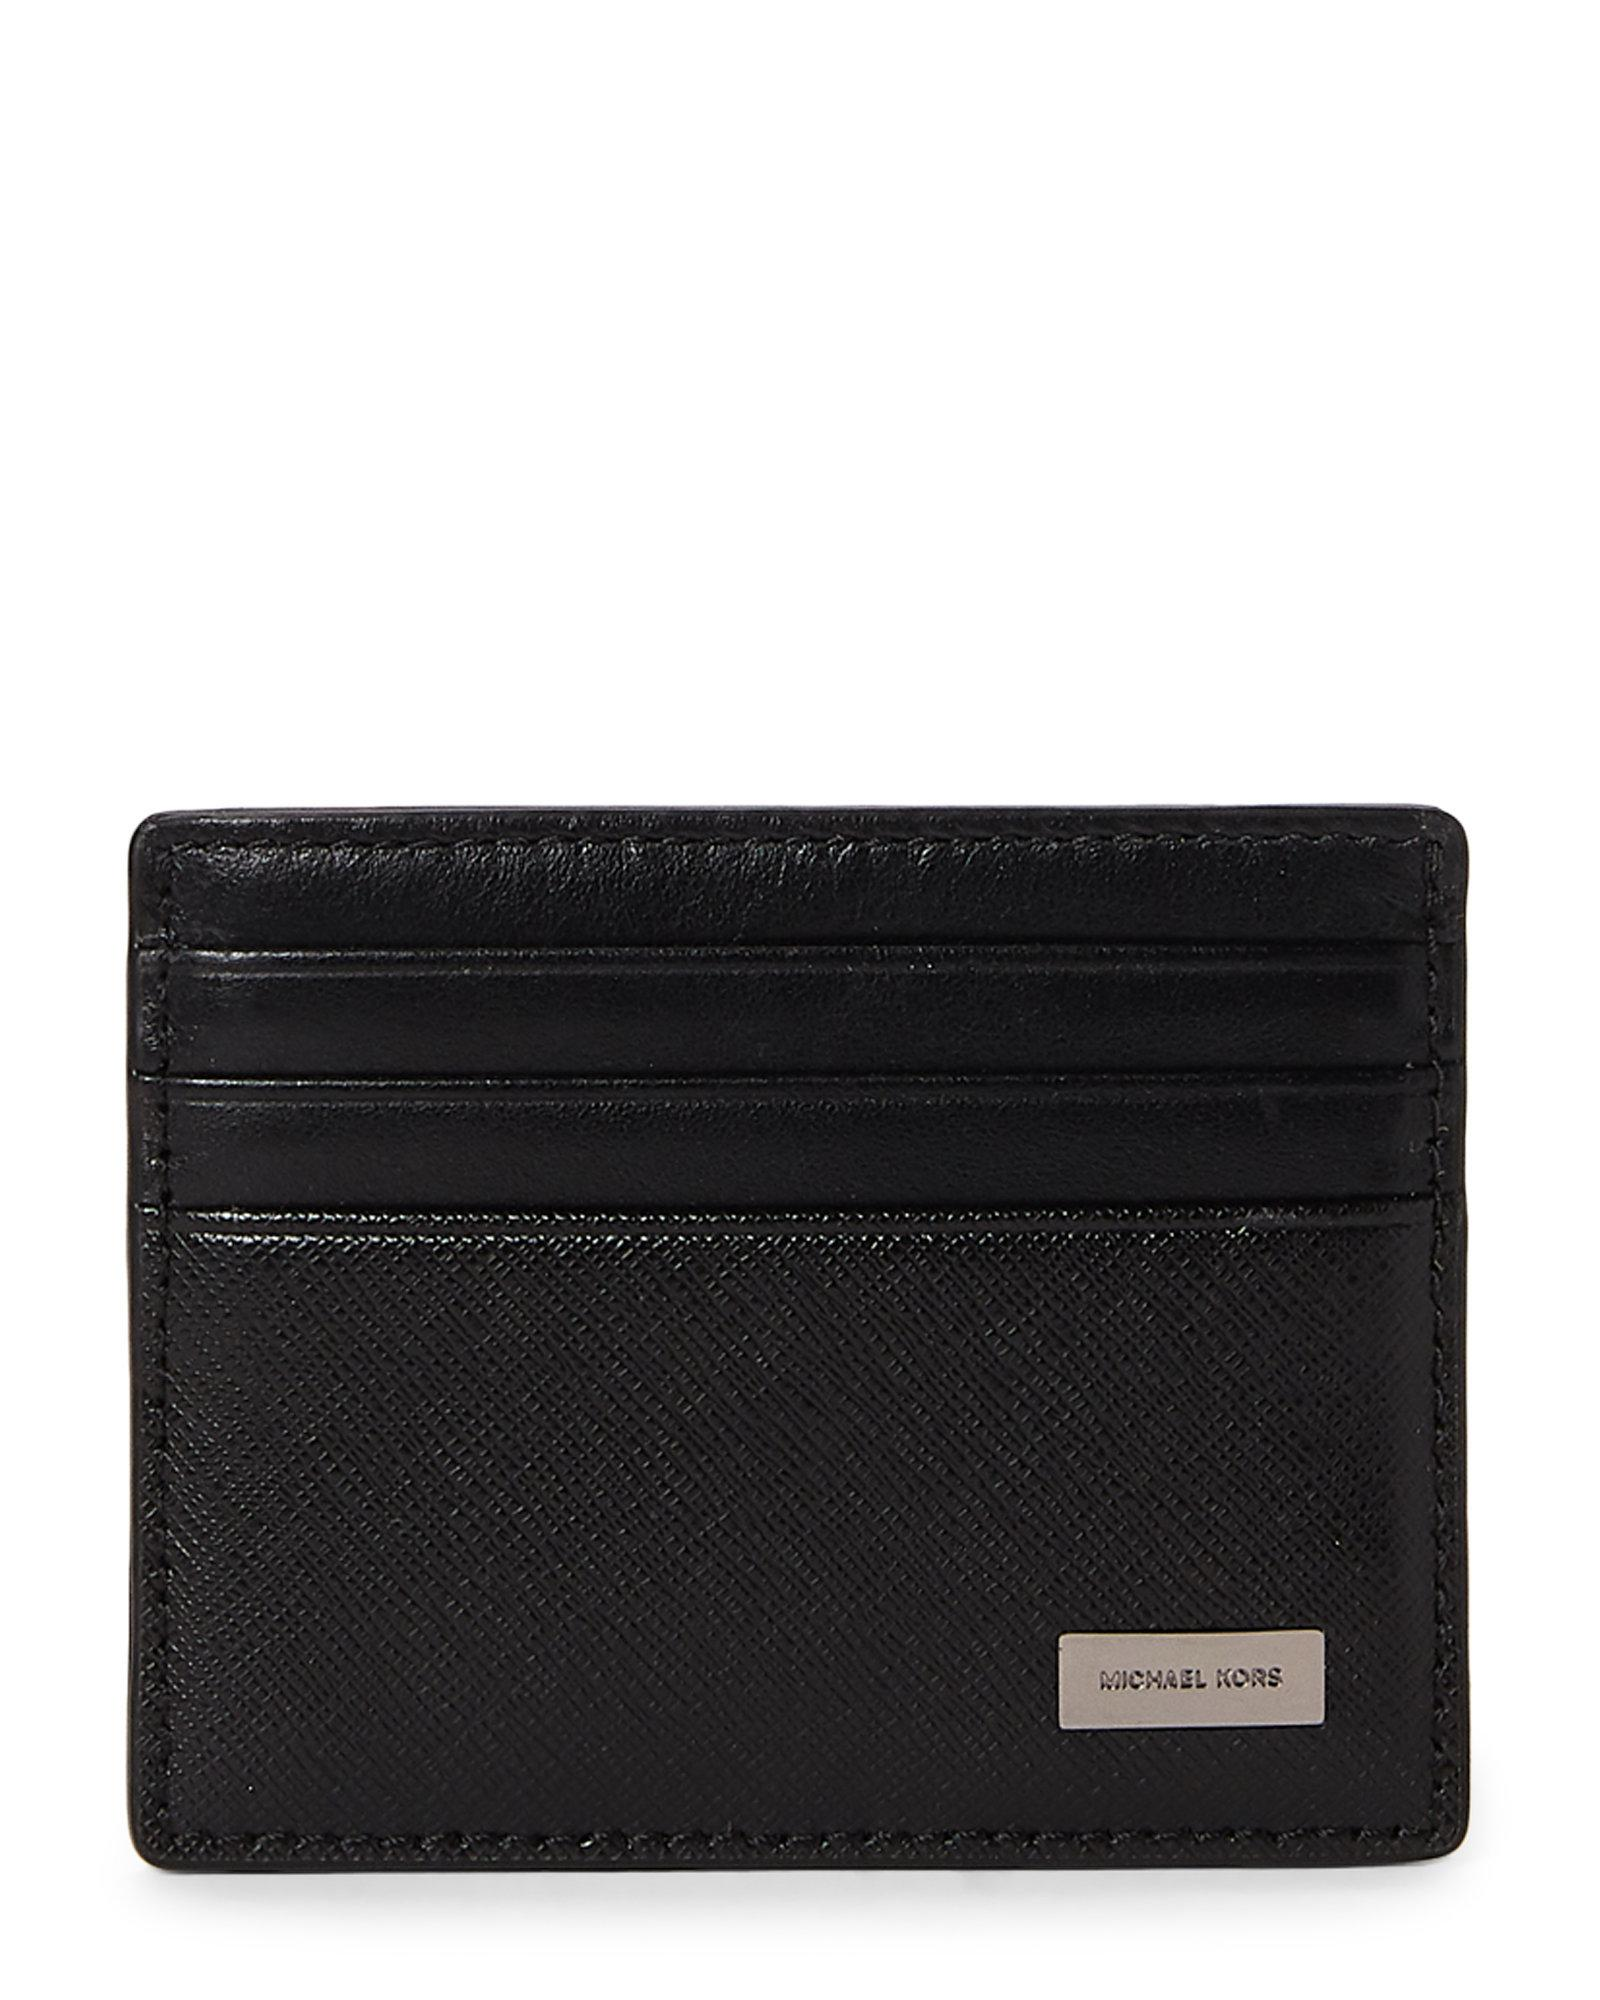 00332f7cd6805 Lyst - Michael Kors Black Leather Tall Card Case in Black for Men